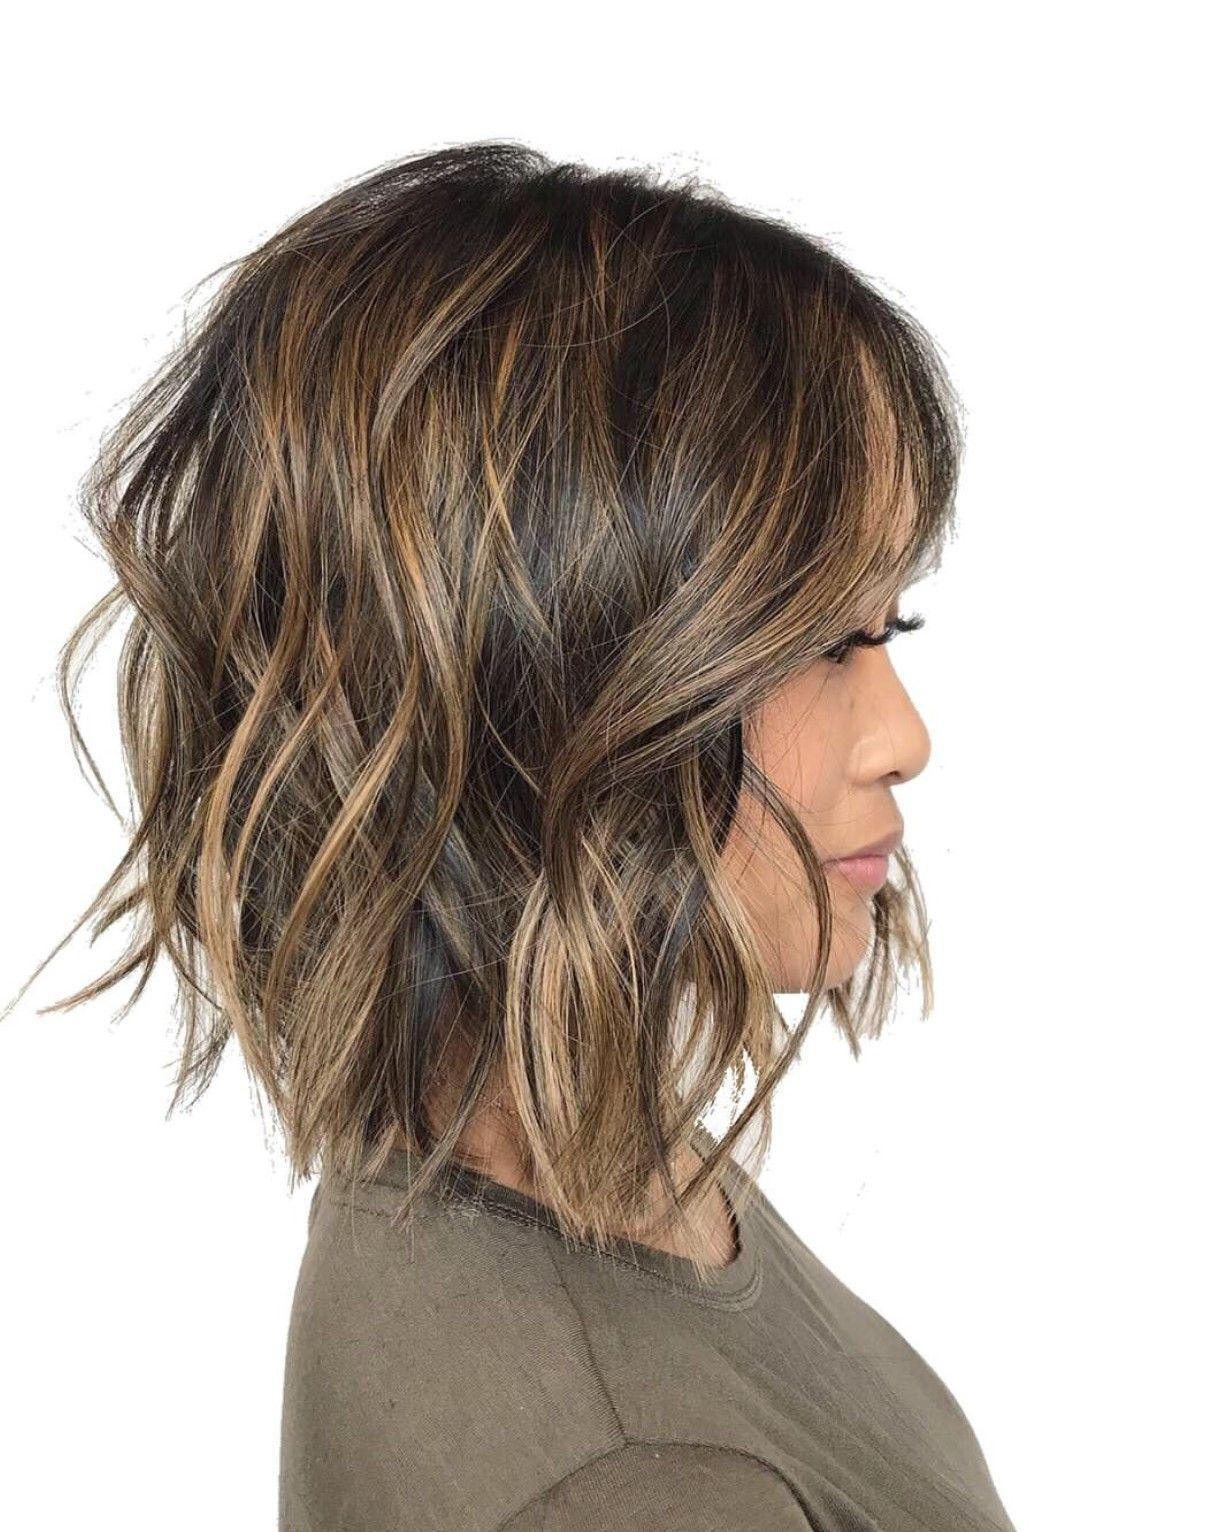 Short Dark Brunette Balayage From Hmb Hair Makeup Beauty Honolulu Hawaii Haare Balayage Haarschnitt Ideen Brunette Haarfarbe